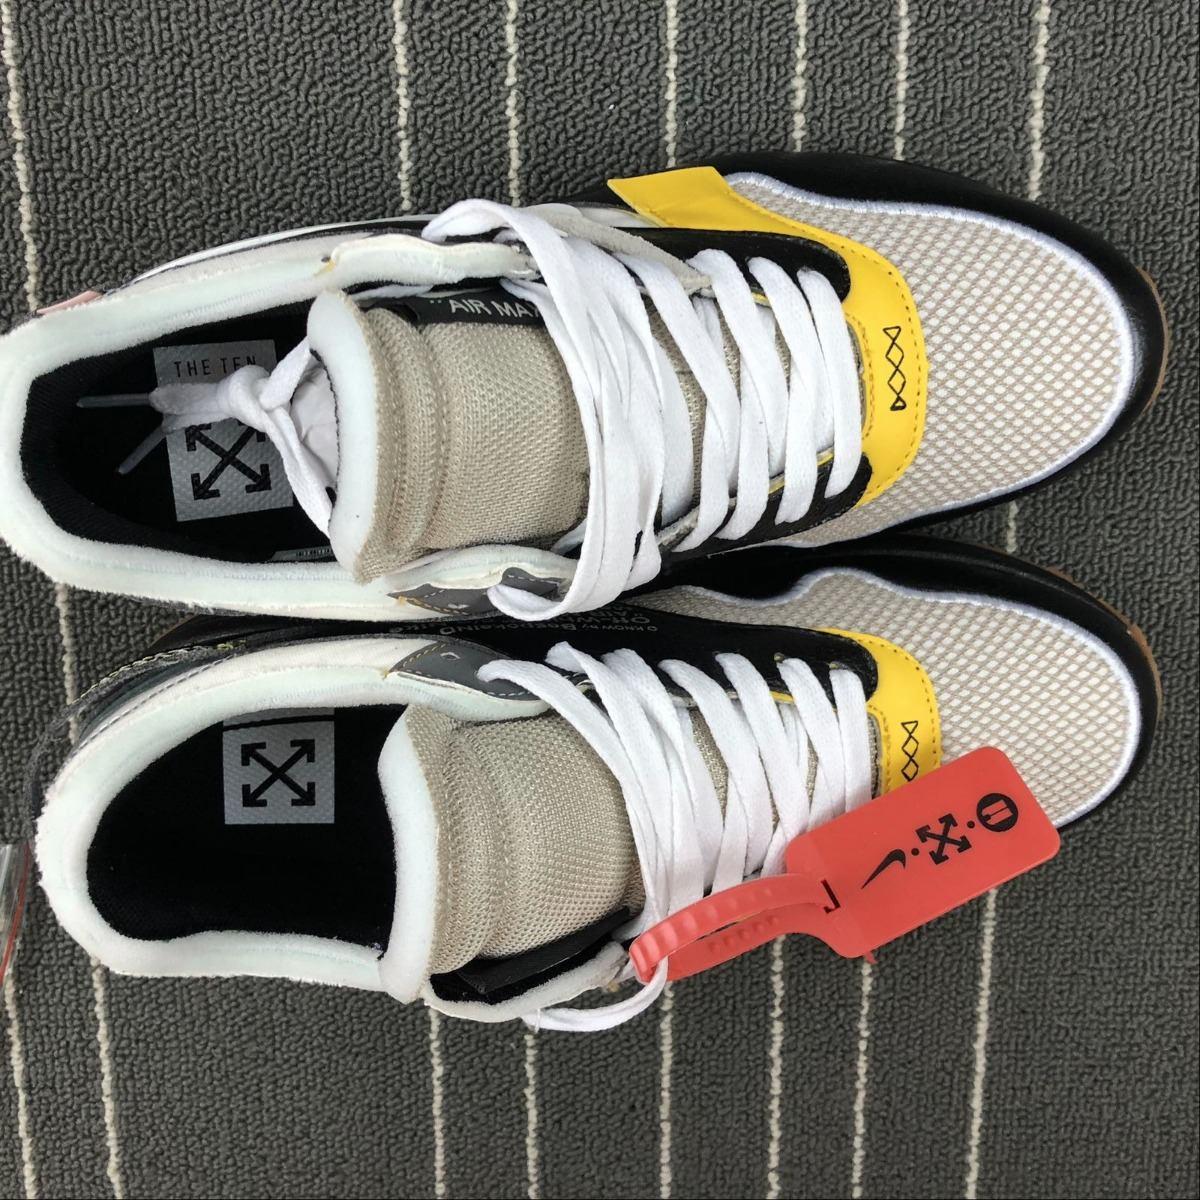 Zapatillas Nike Air Max 1 X Off white :40 45 Exclusive Line